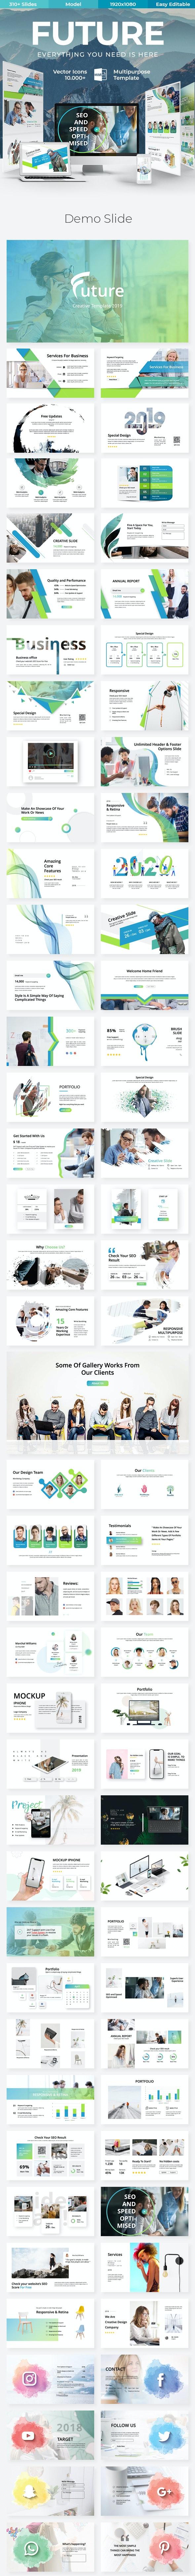 Future Creative Premium Google Slide Template - Google Slides Presentation Templates